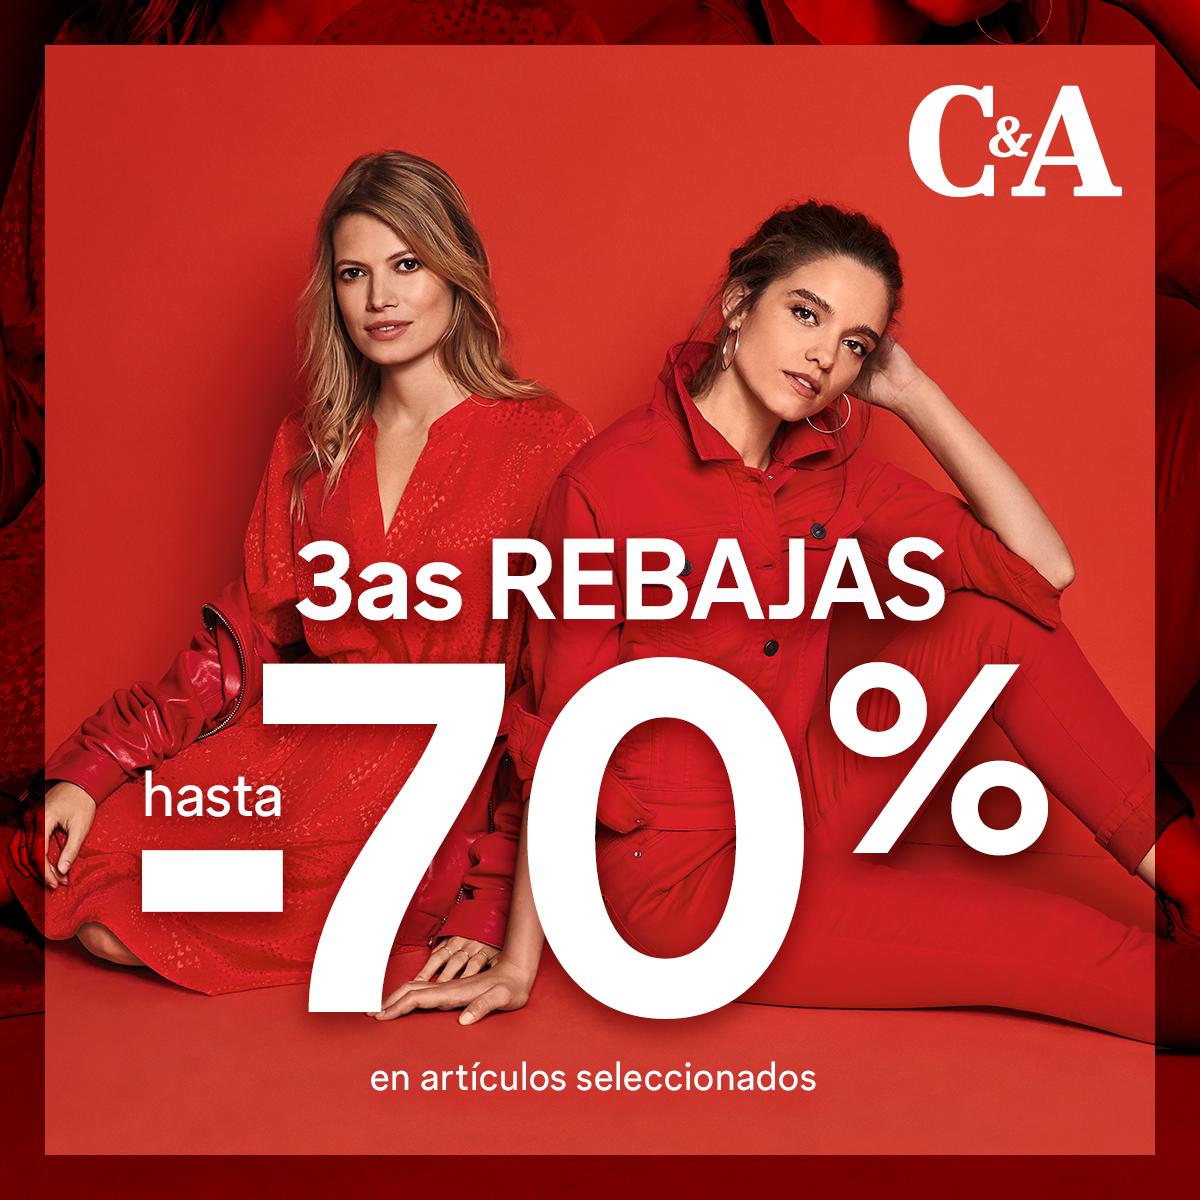 Oferta C&A